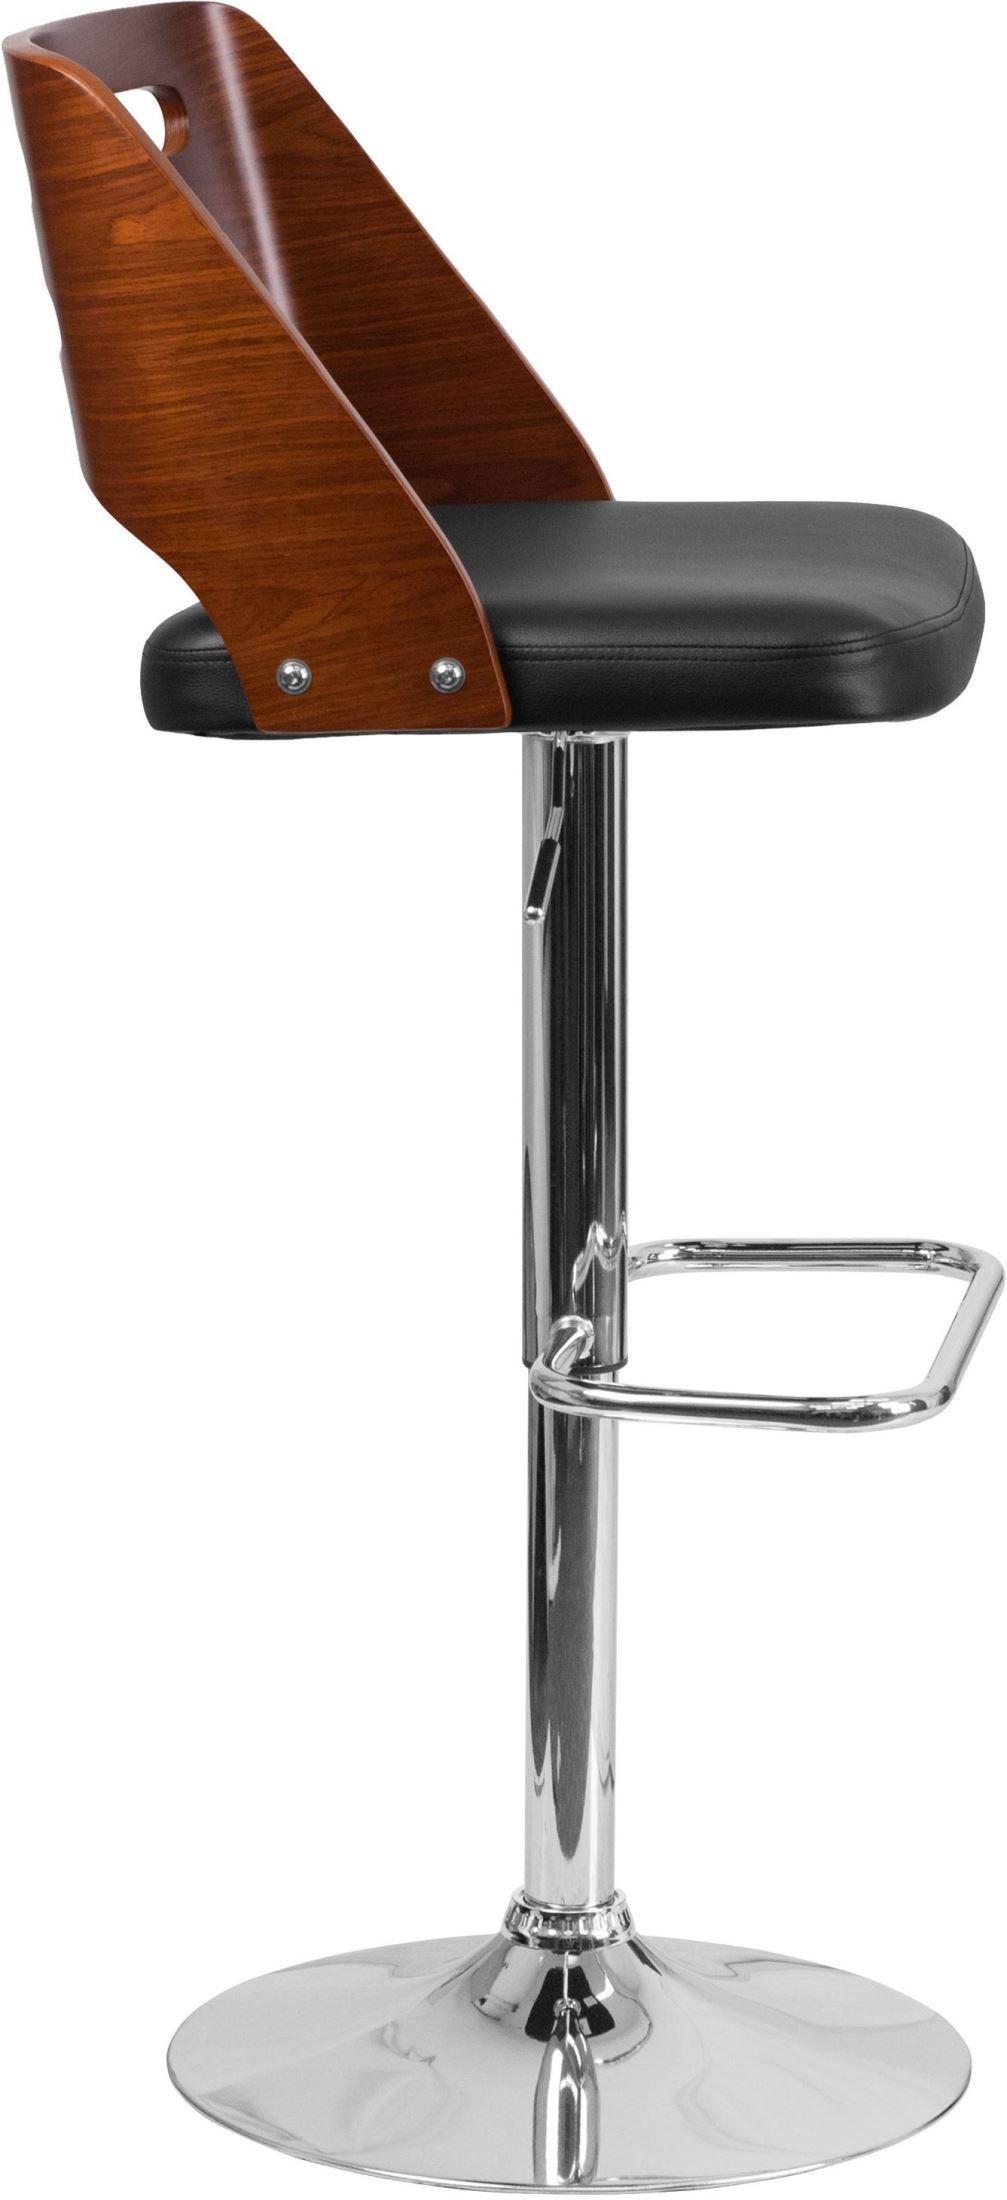 32382 Walnut Bentwood Adjustable Height Bar Stool From